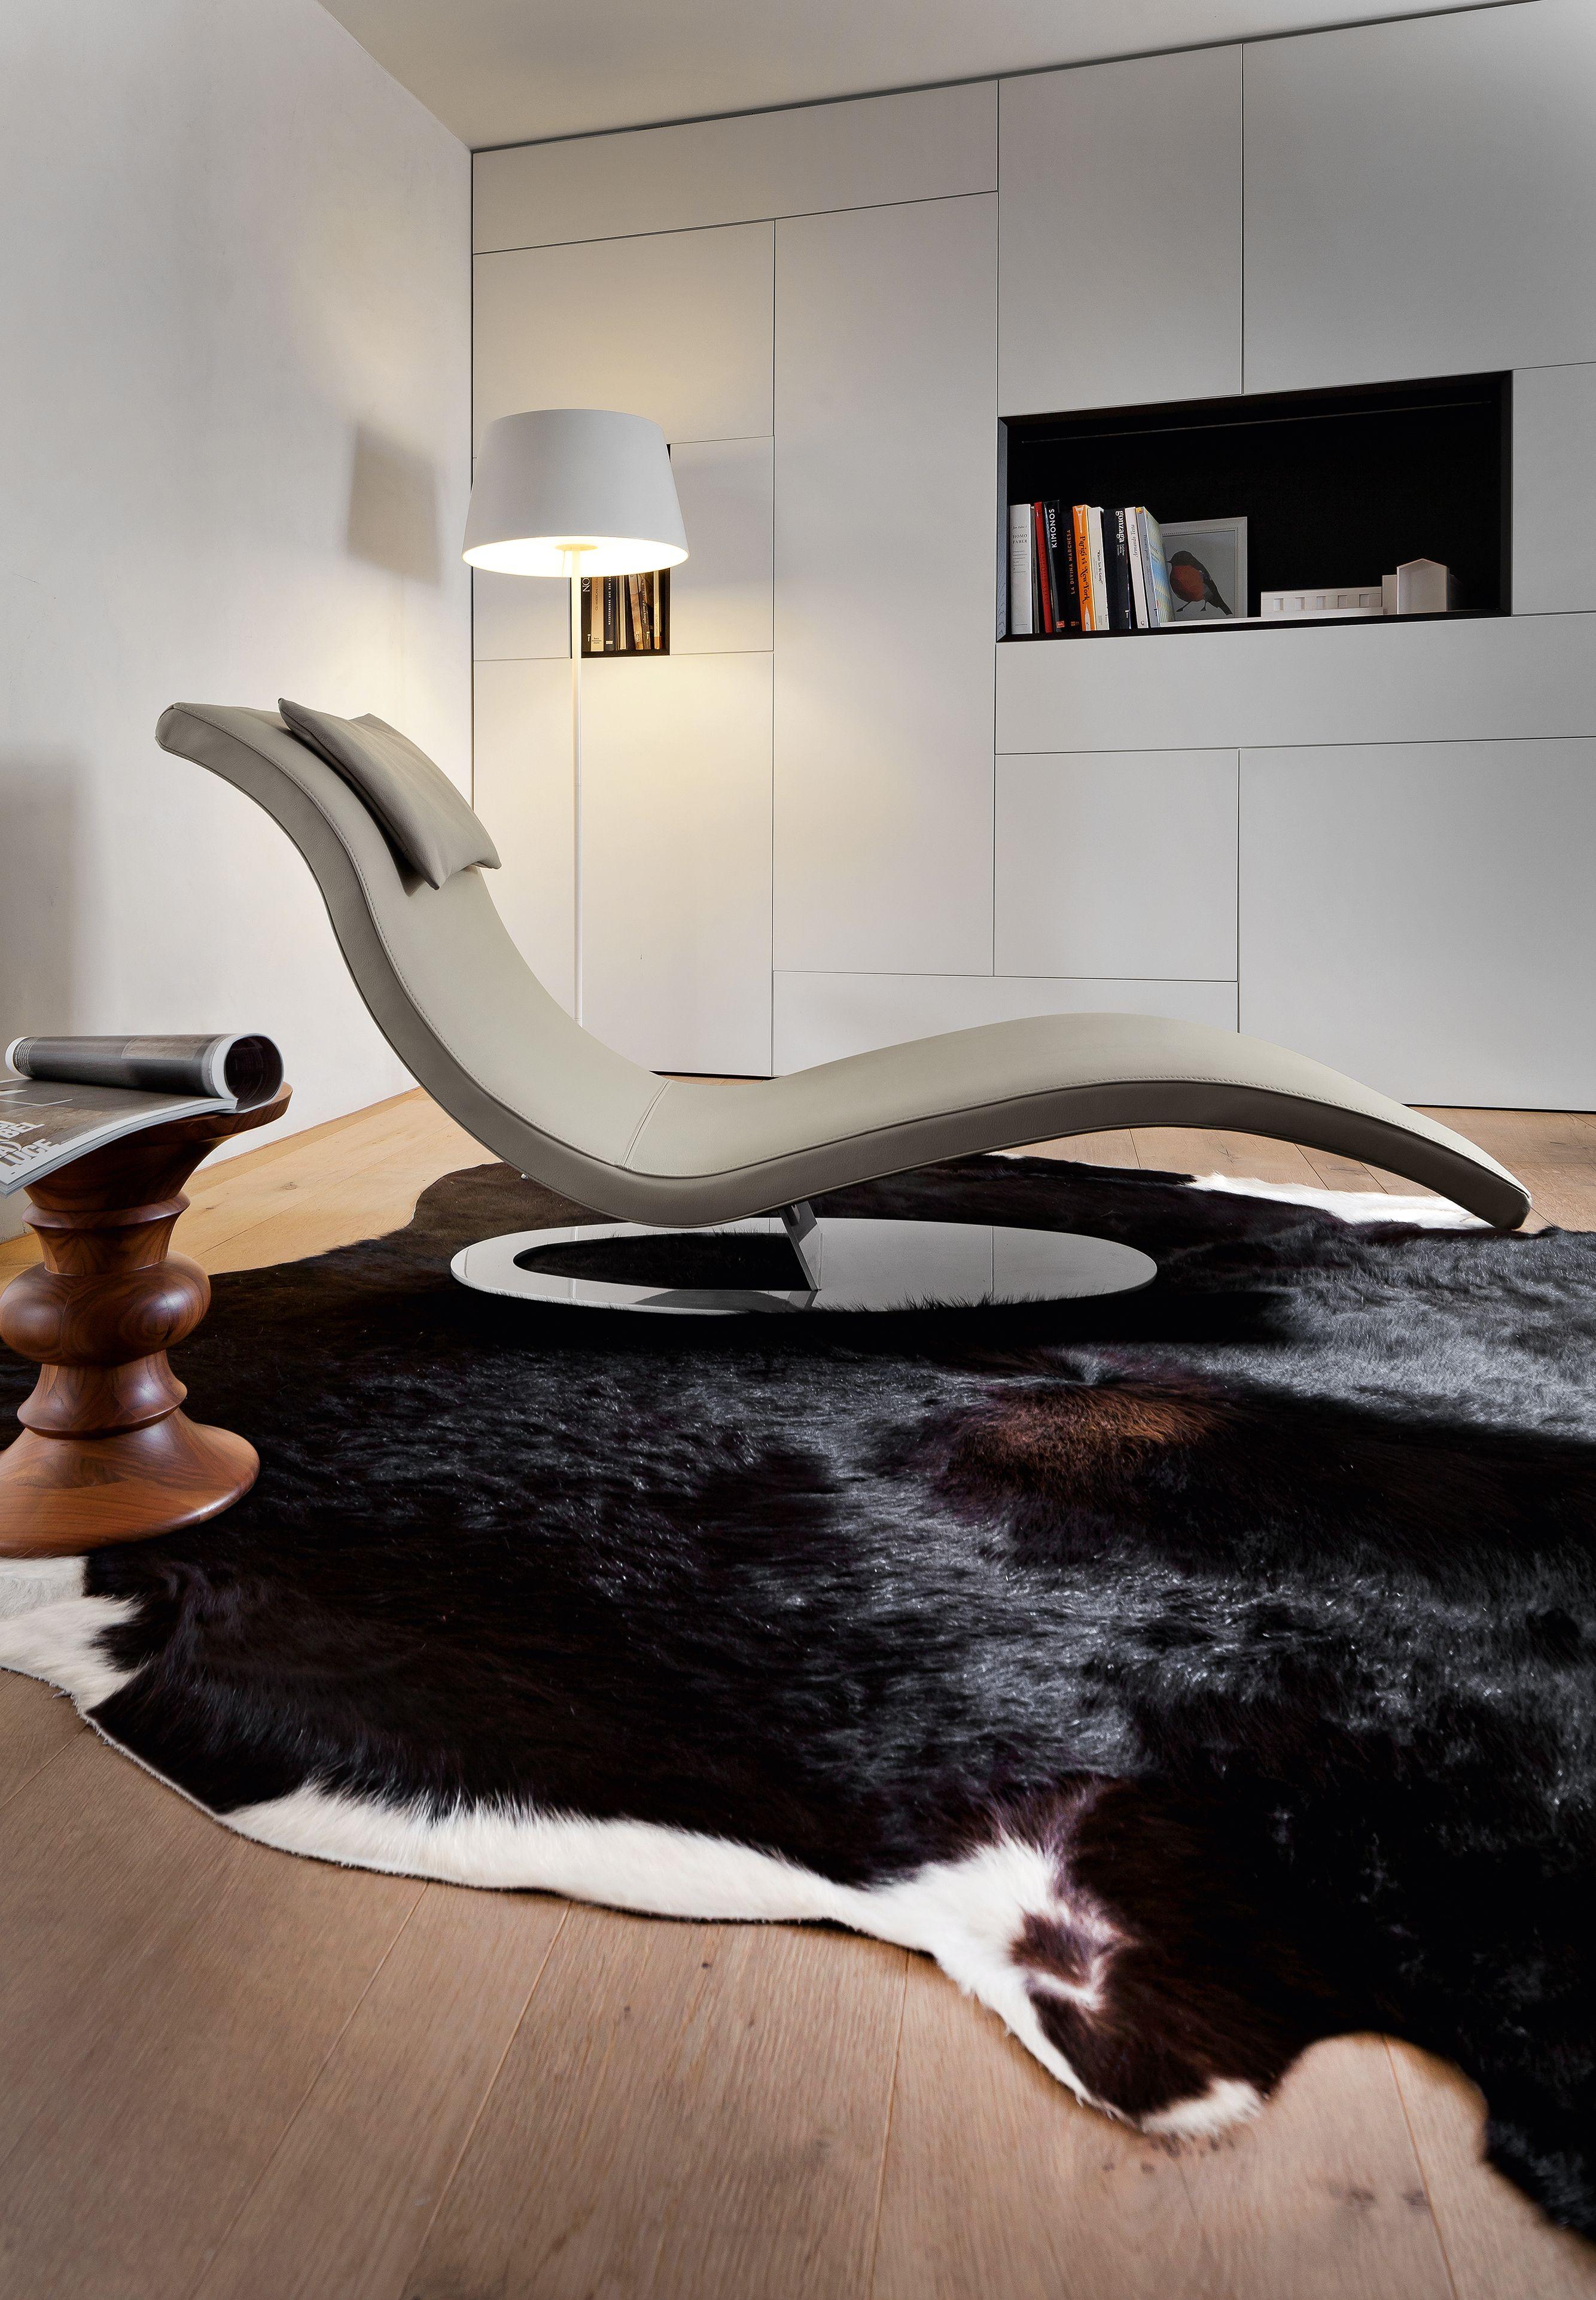 Osez Le Confort Osez Kuchen Spezialist Canape Fauteuil Chaise Design Confort Goruntuler Ile Kitapliklar